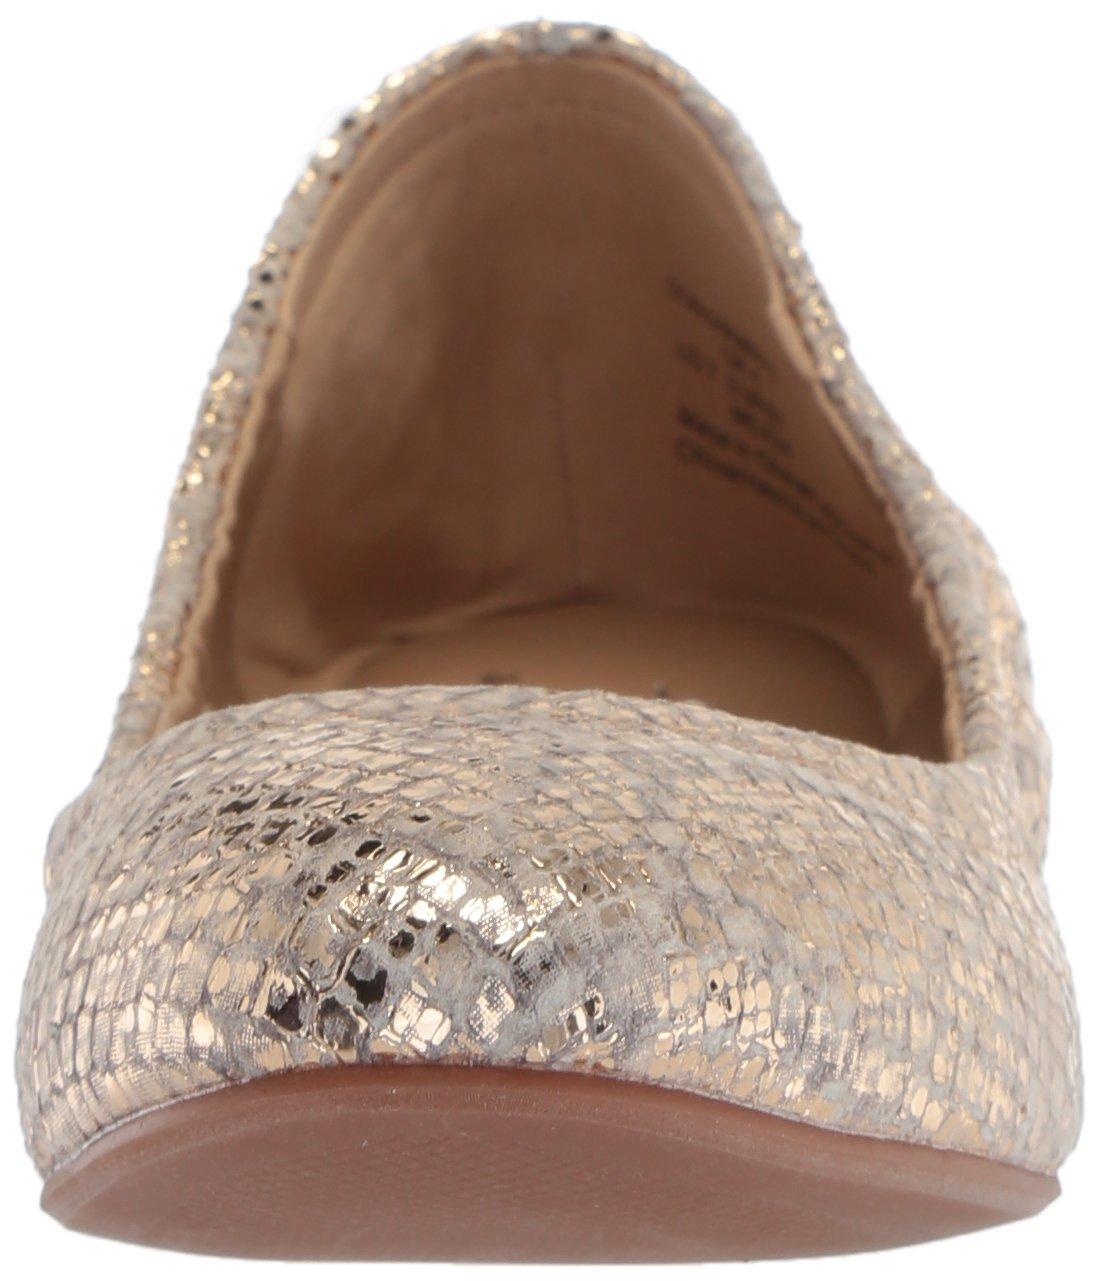 The Fix Women's Sonya Scrunch Metallic Ballet Flat B07712BXB3 6.5 Embossed B(M) US|Gold Metallic Snake Embossed 6.5 Leather 790ed2